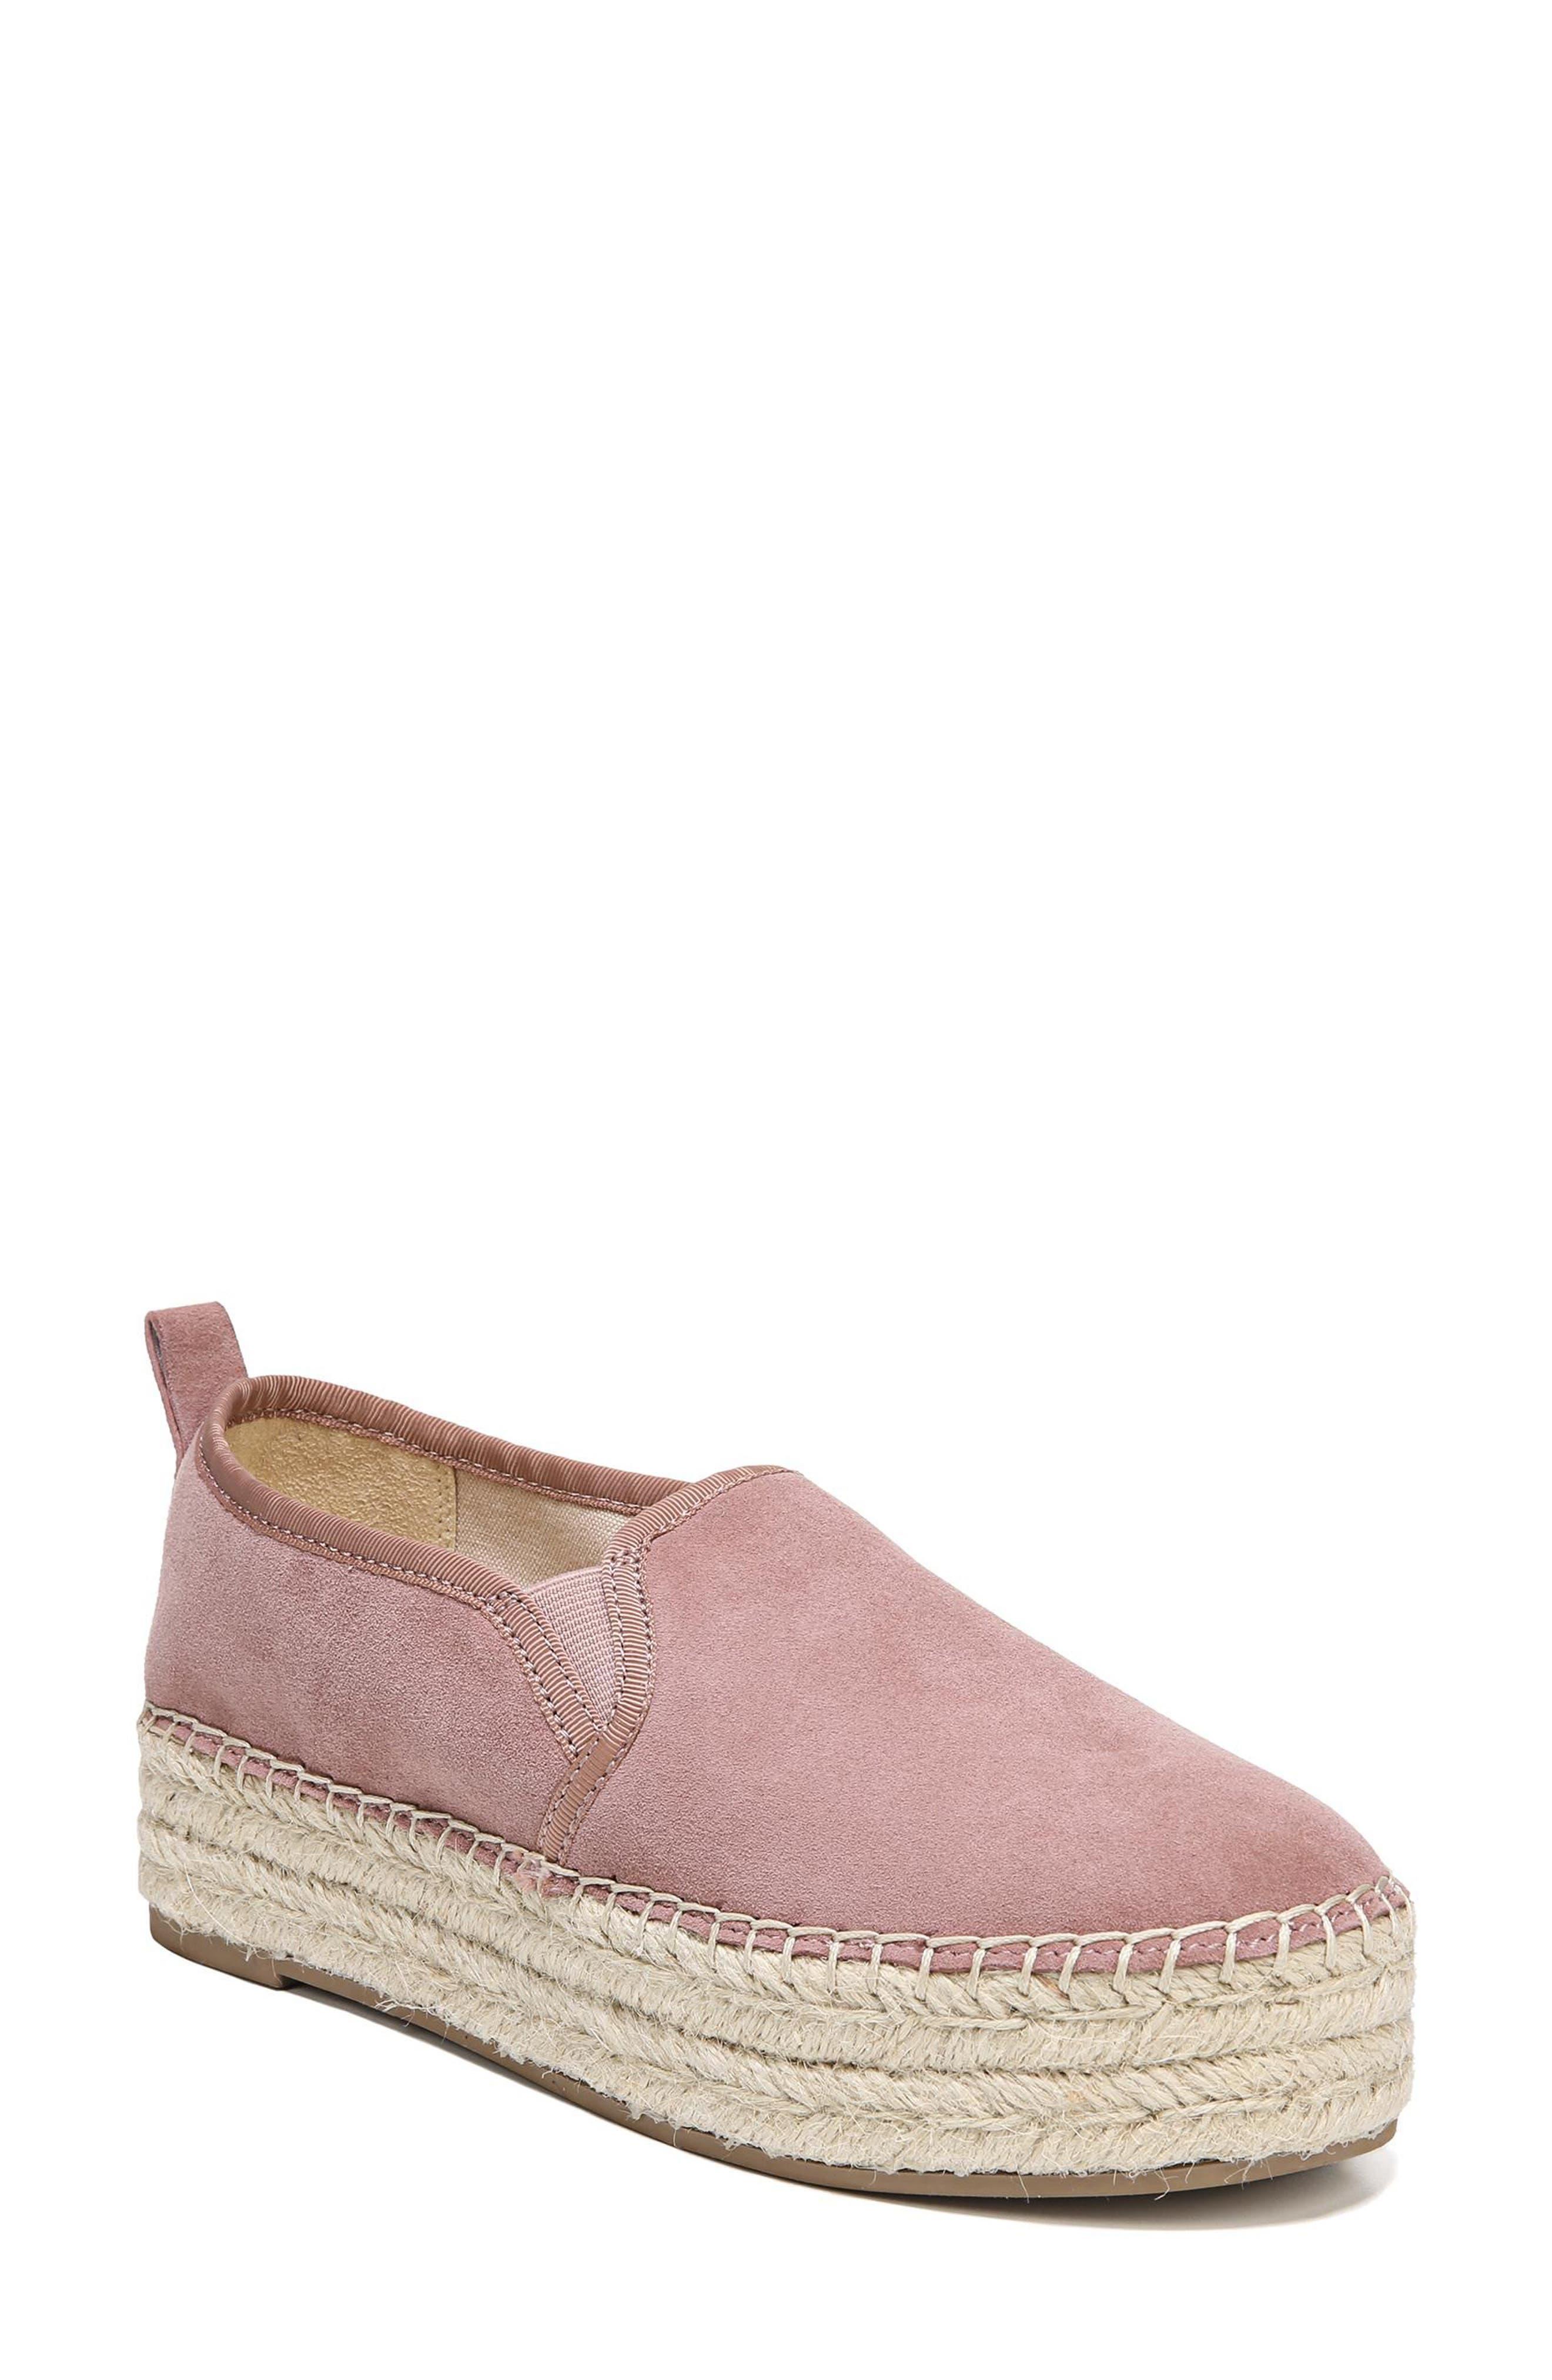 c00a70857f55 Sam Edelman Shoes